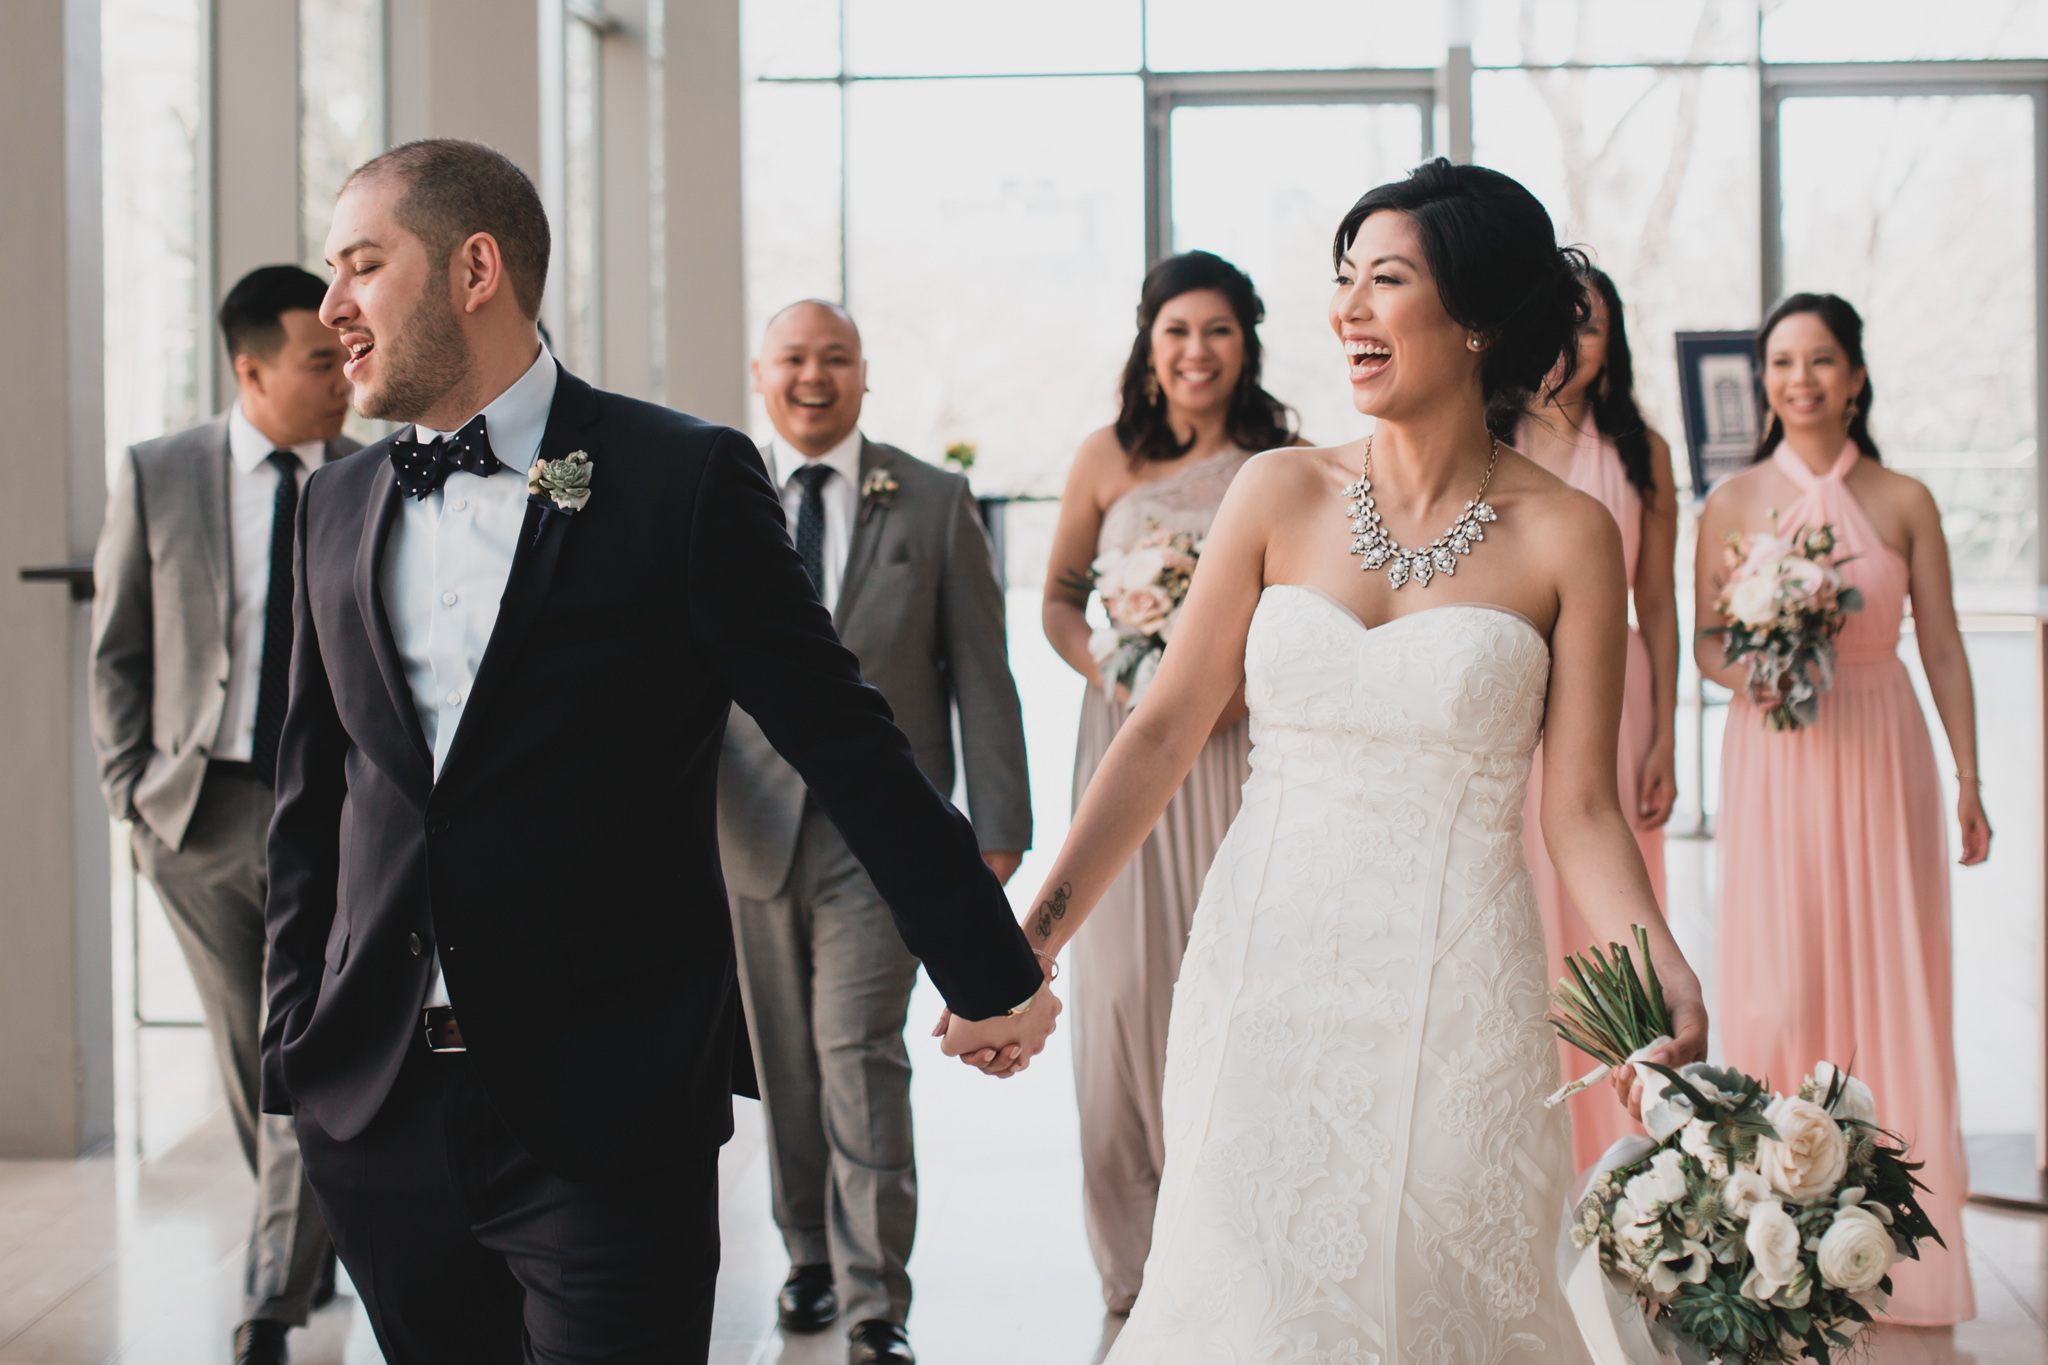 Candid Group Wedding Photos